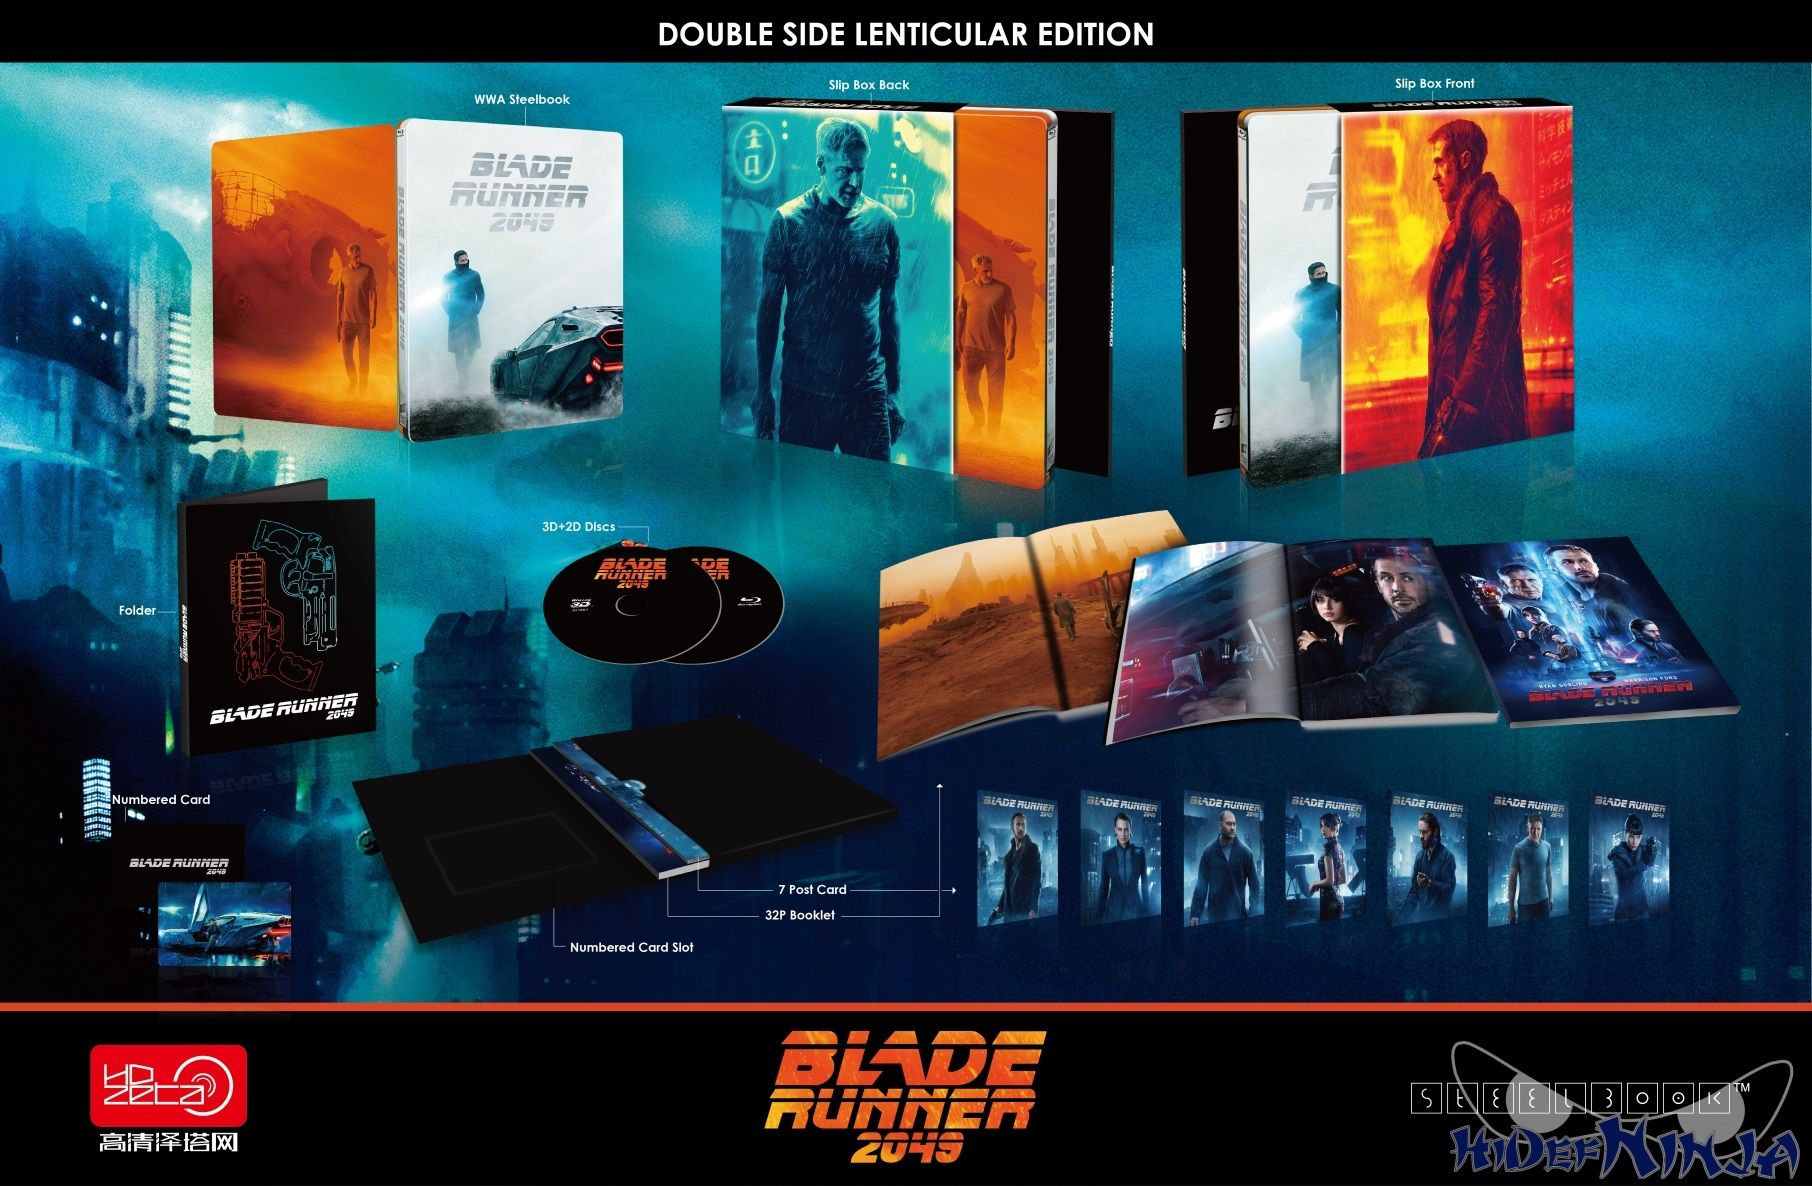 Blade Runner 2049 3d Double Lenticular Edition Blu Ray Steelbook Hdzeta Special Edition Silver Label China Film Art